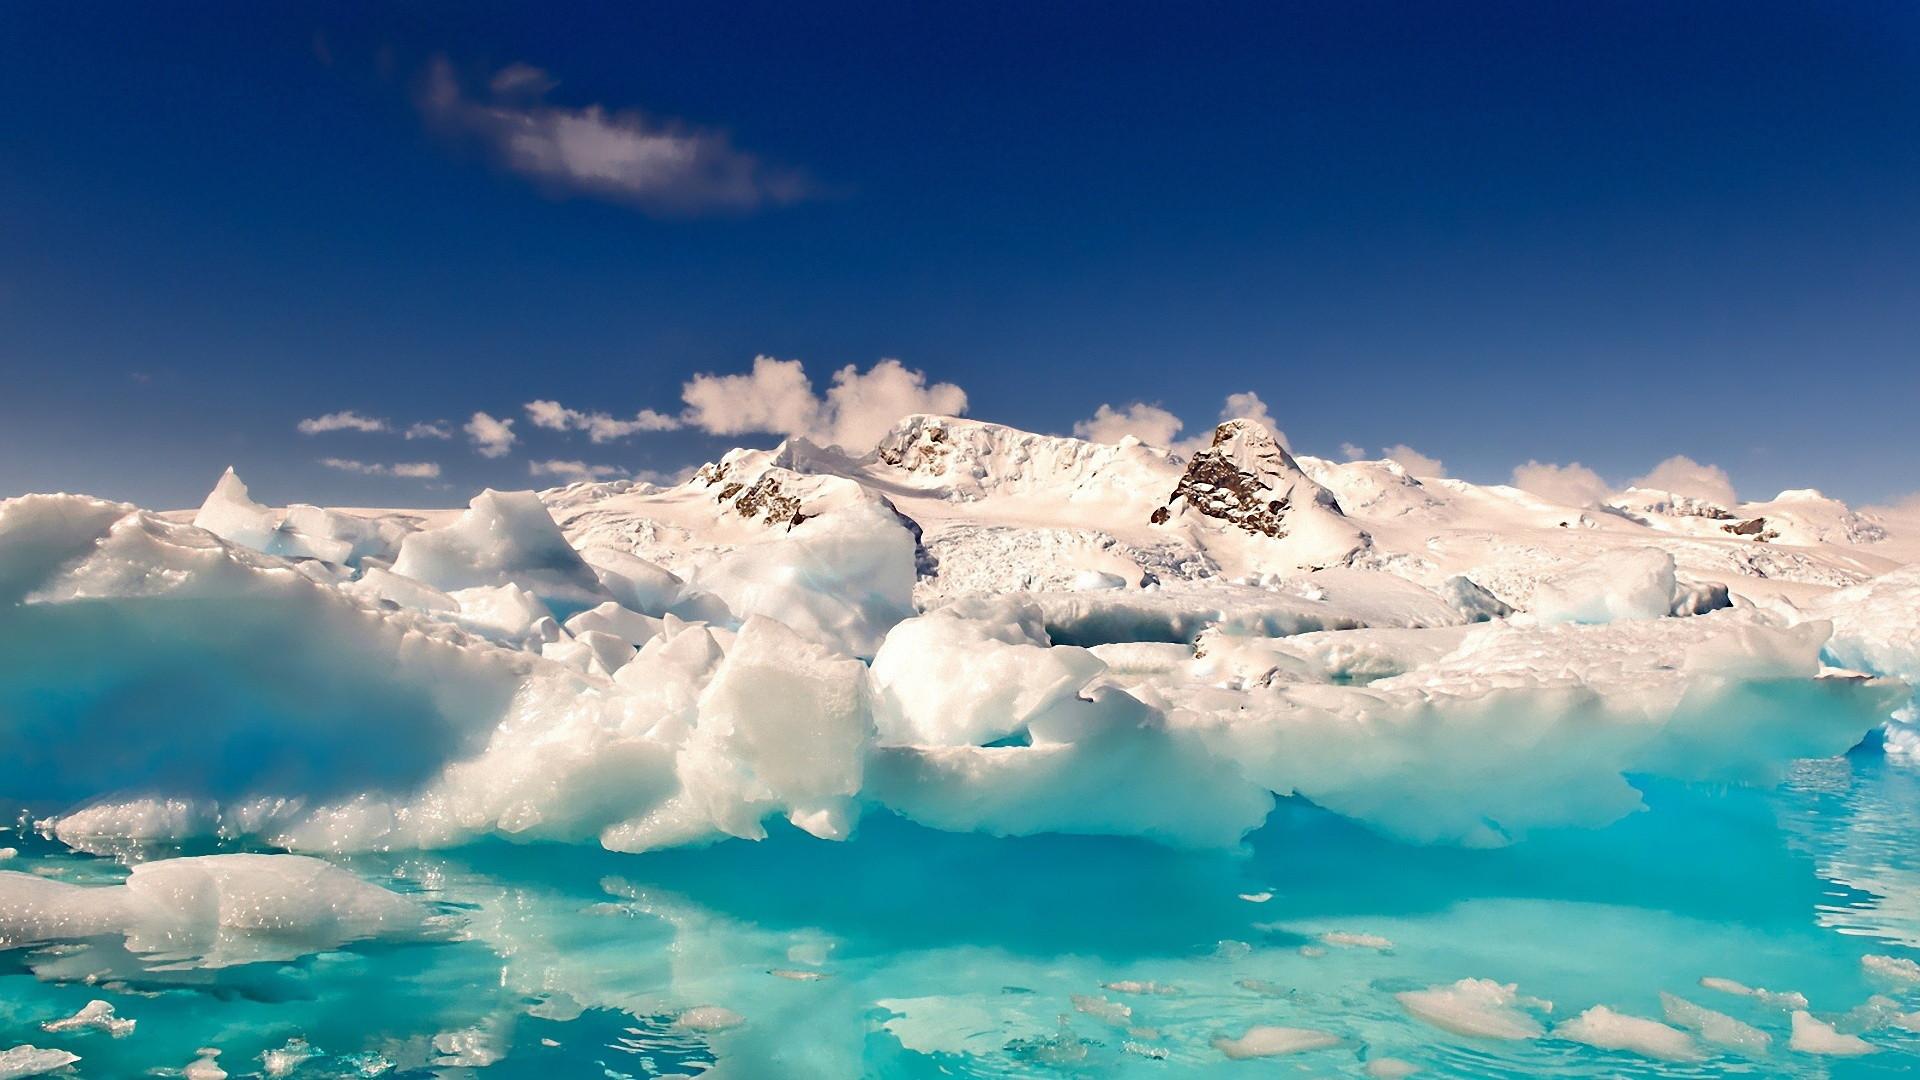 Antarctica Melting Snow Mountain Wallpaper